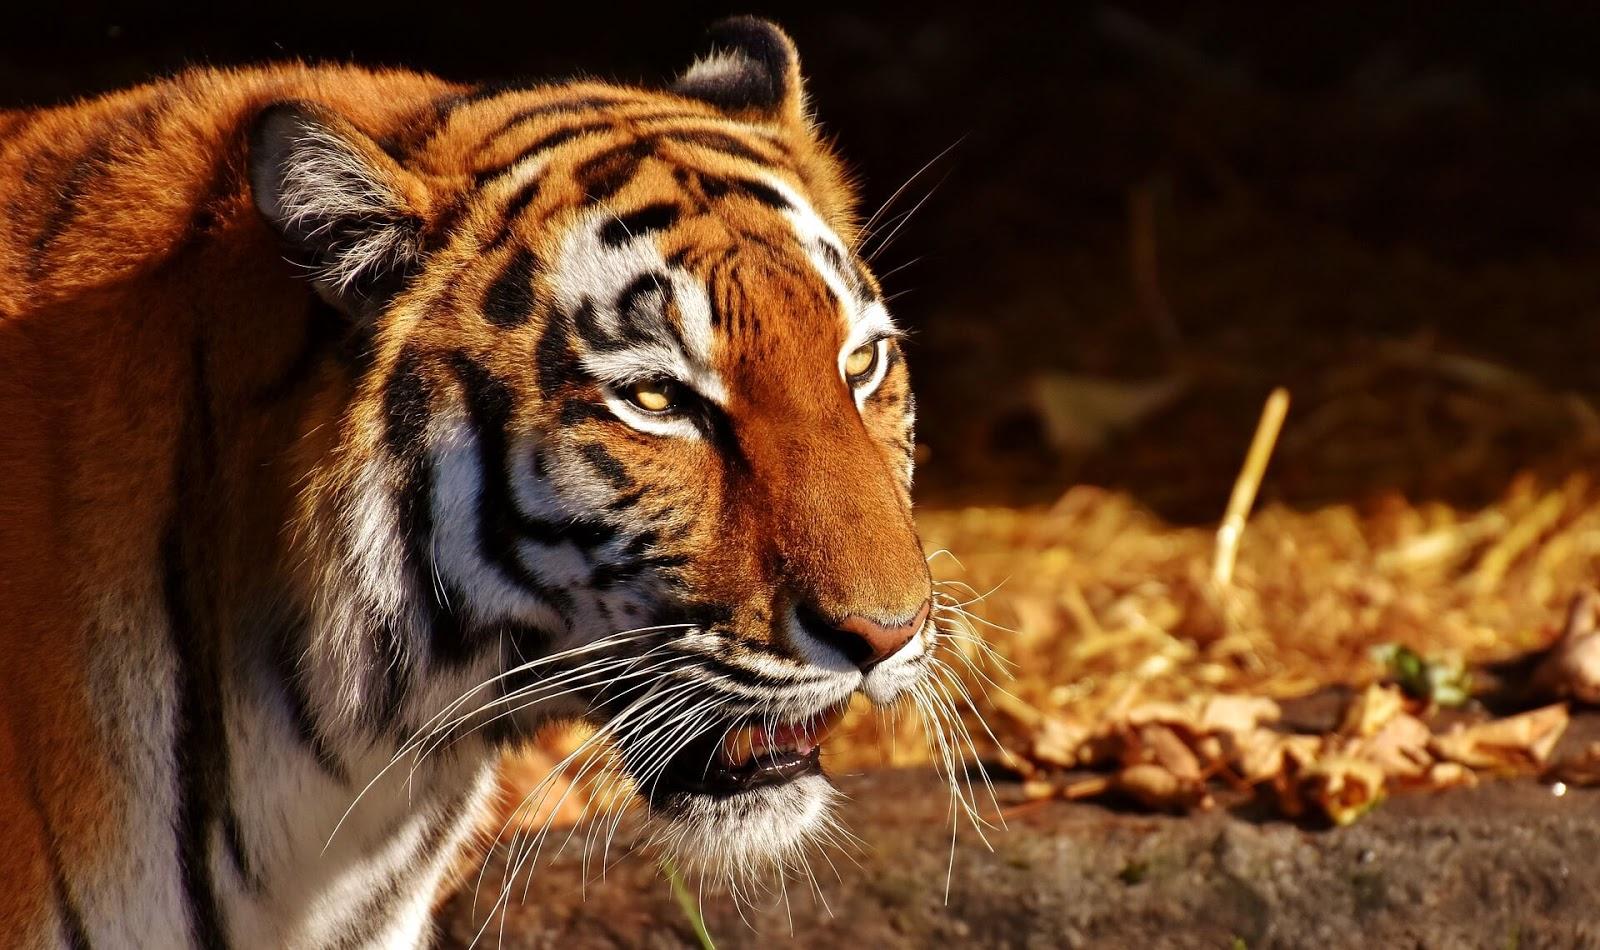 tiger background images hd